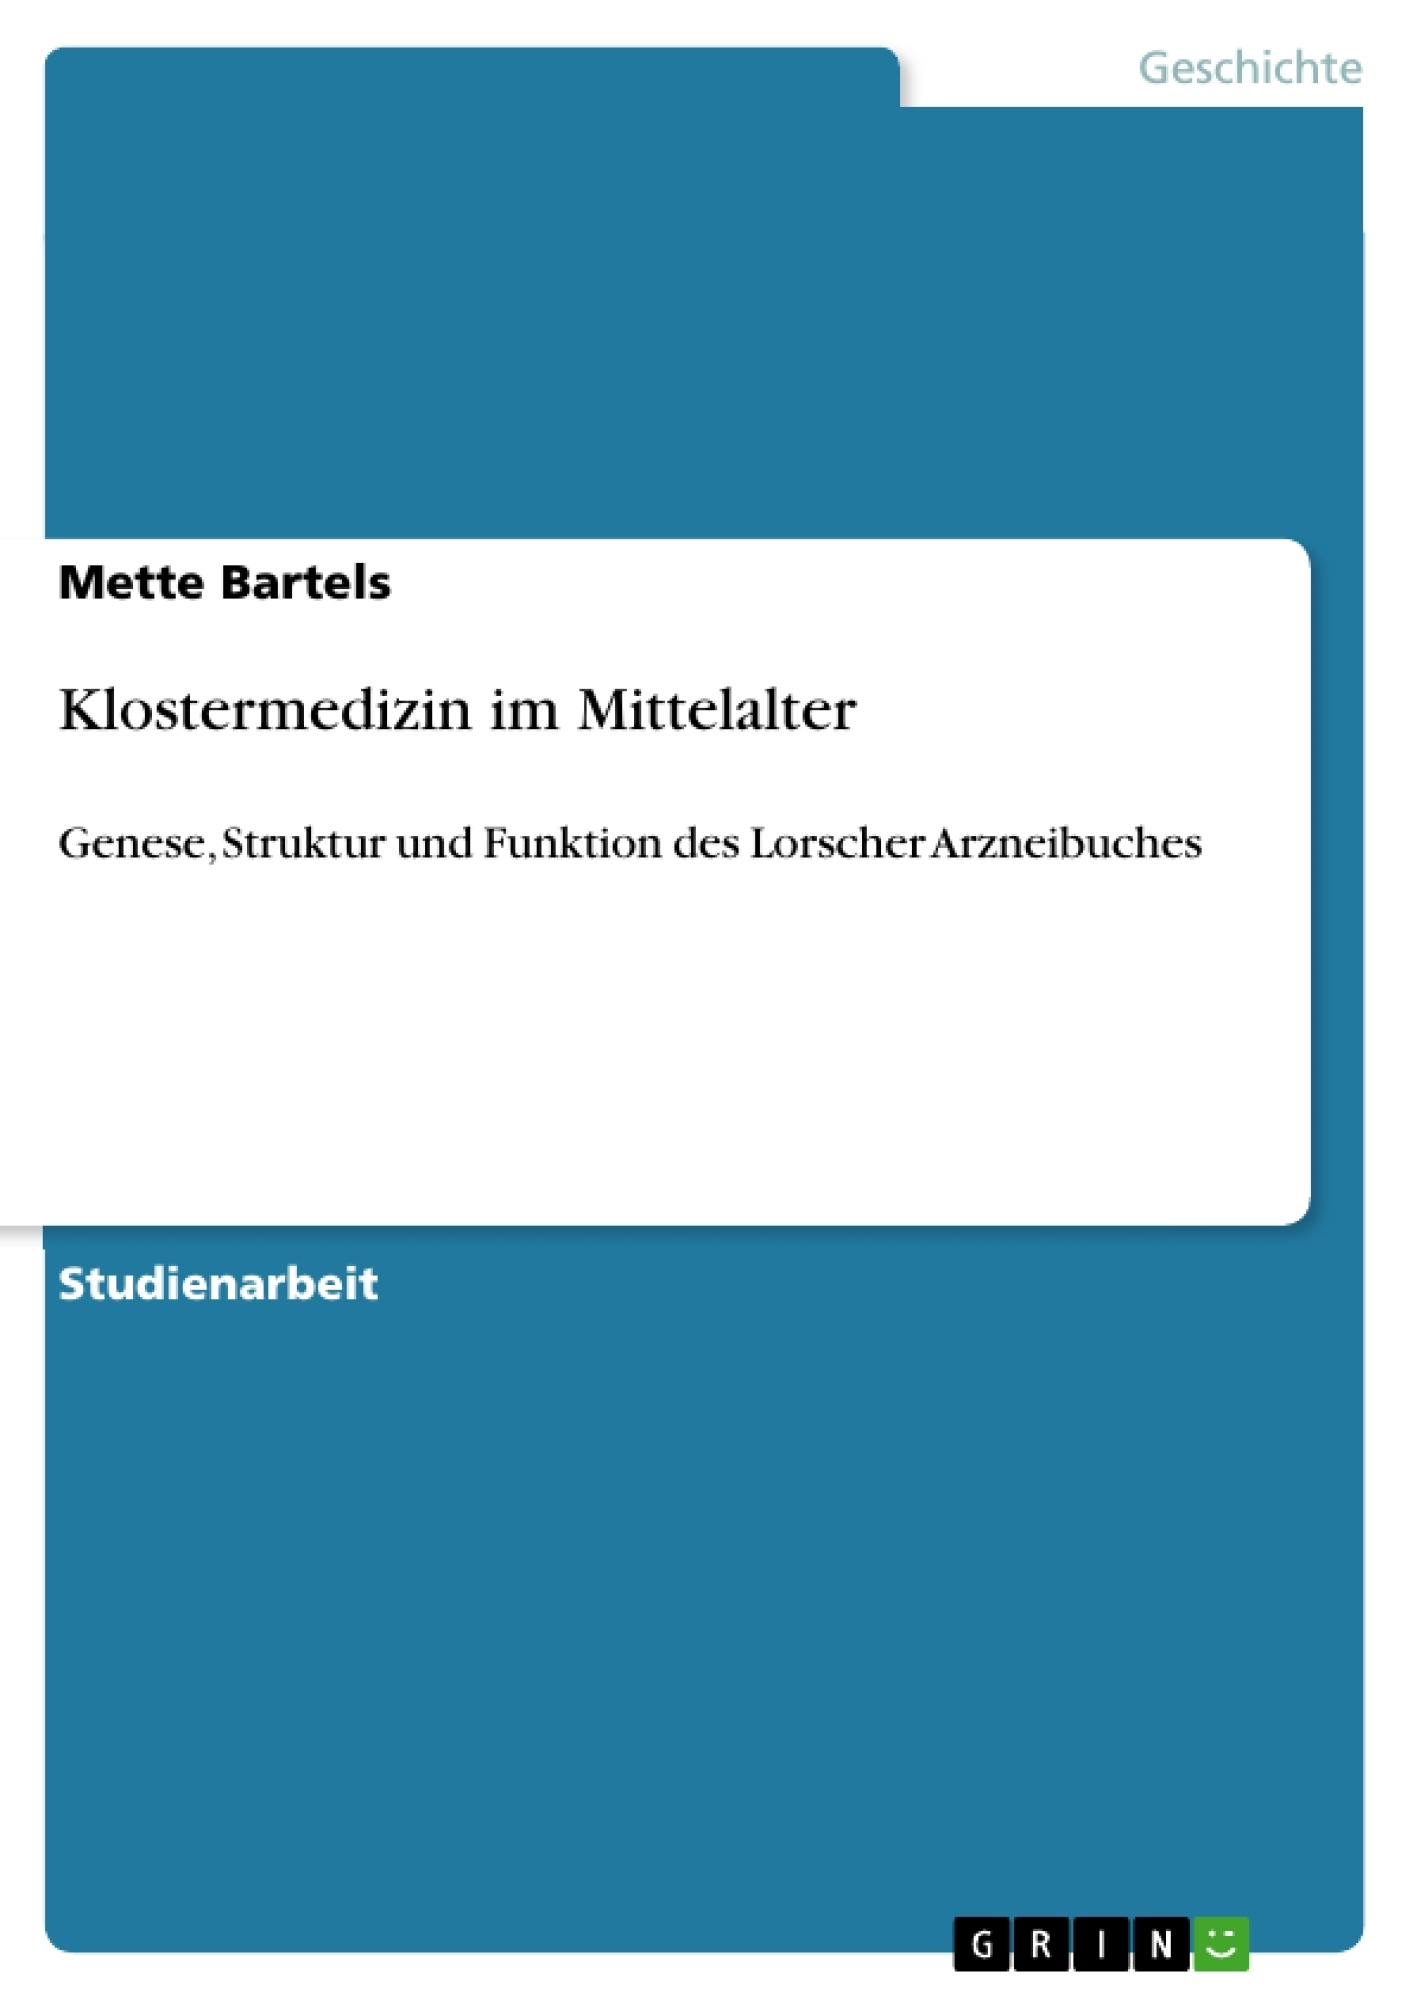 Titel: Klostermedizin im Mittelalter